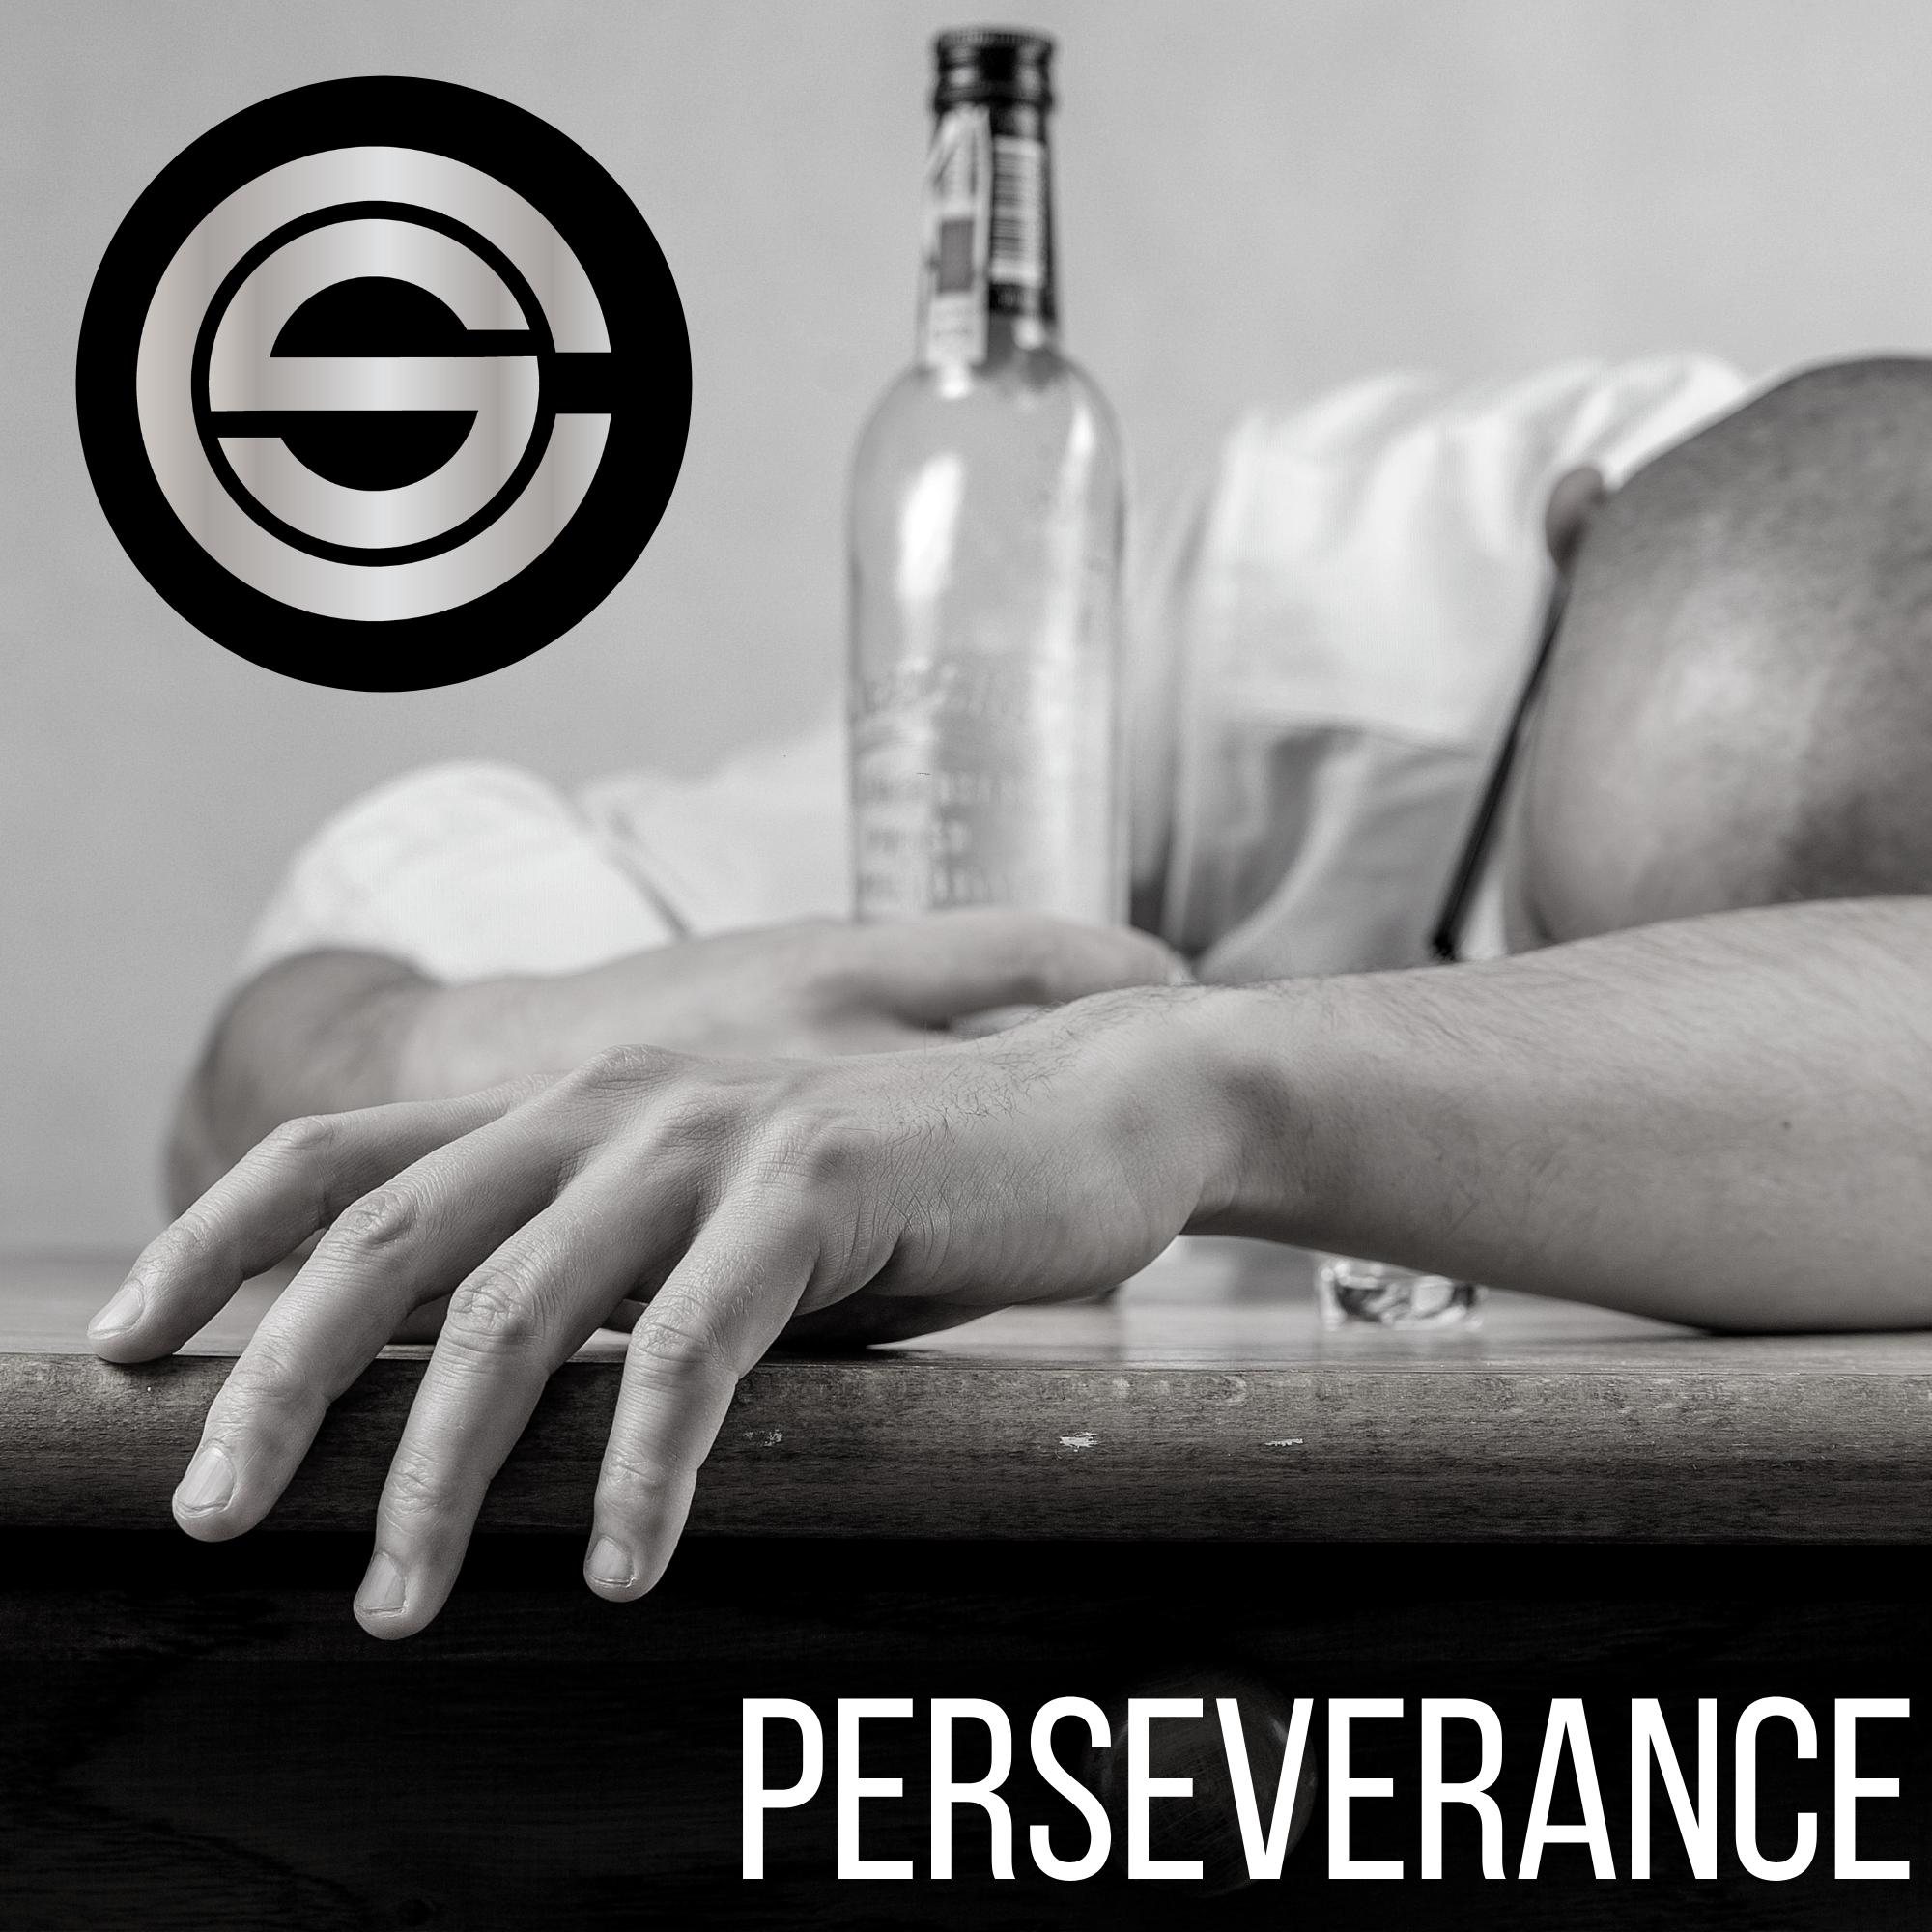 Perseverance by Chris Swan